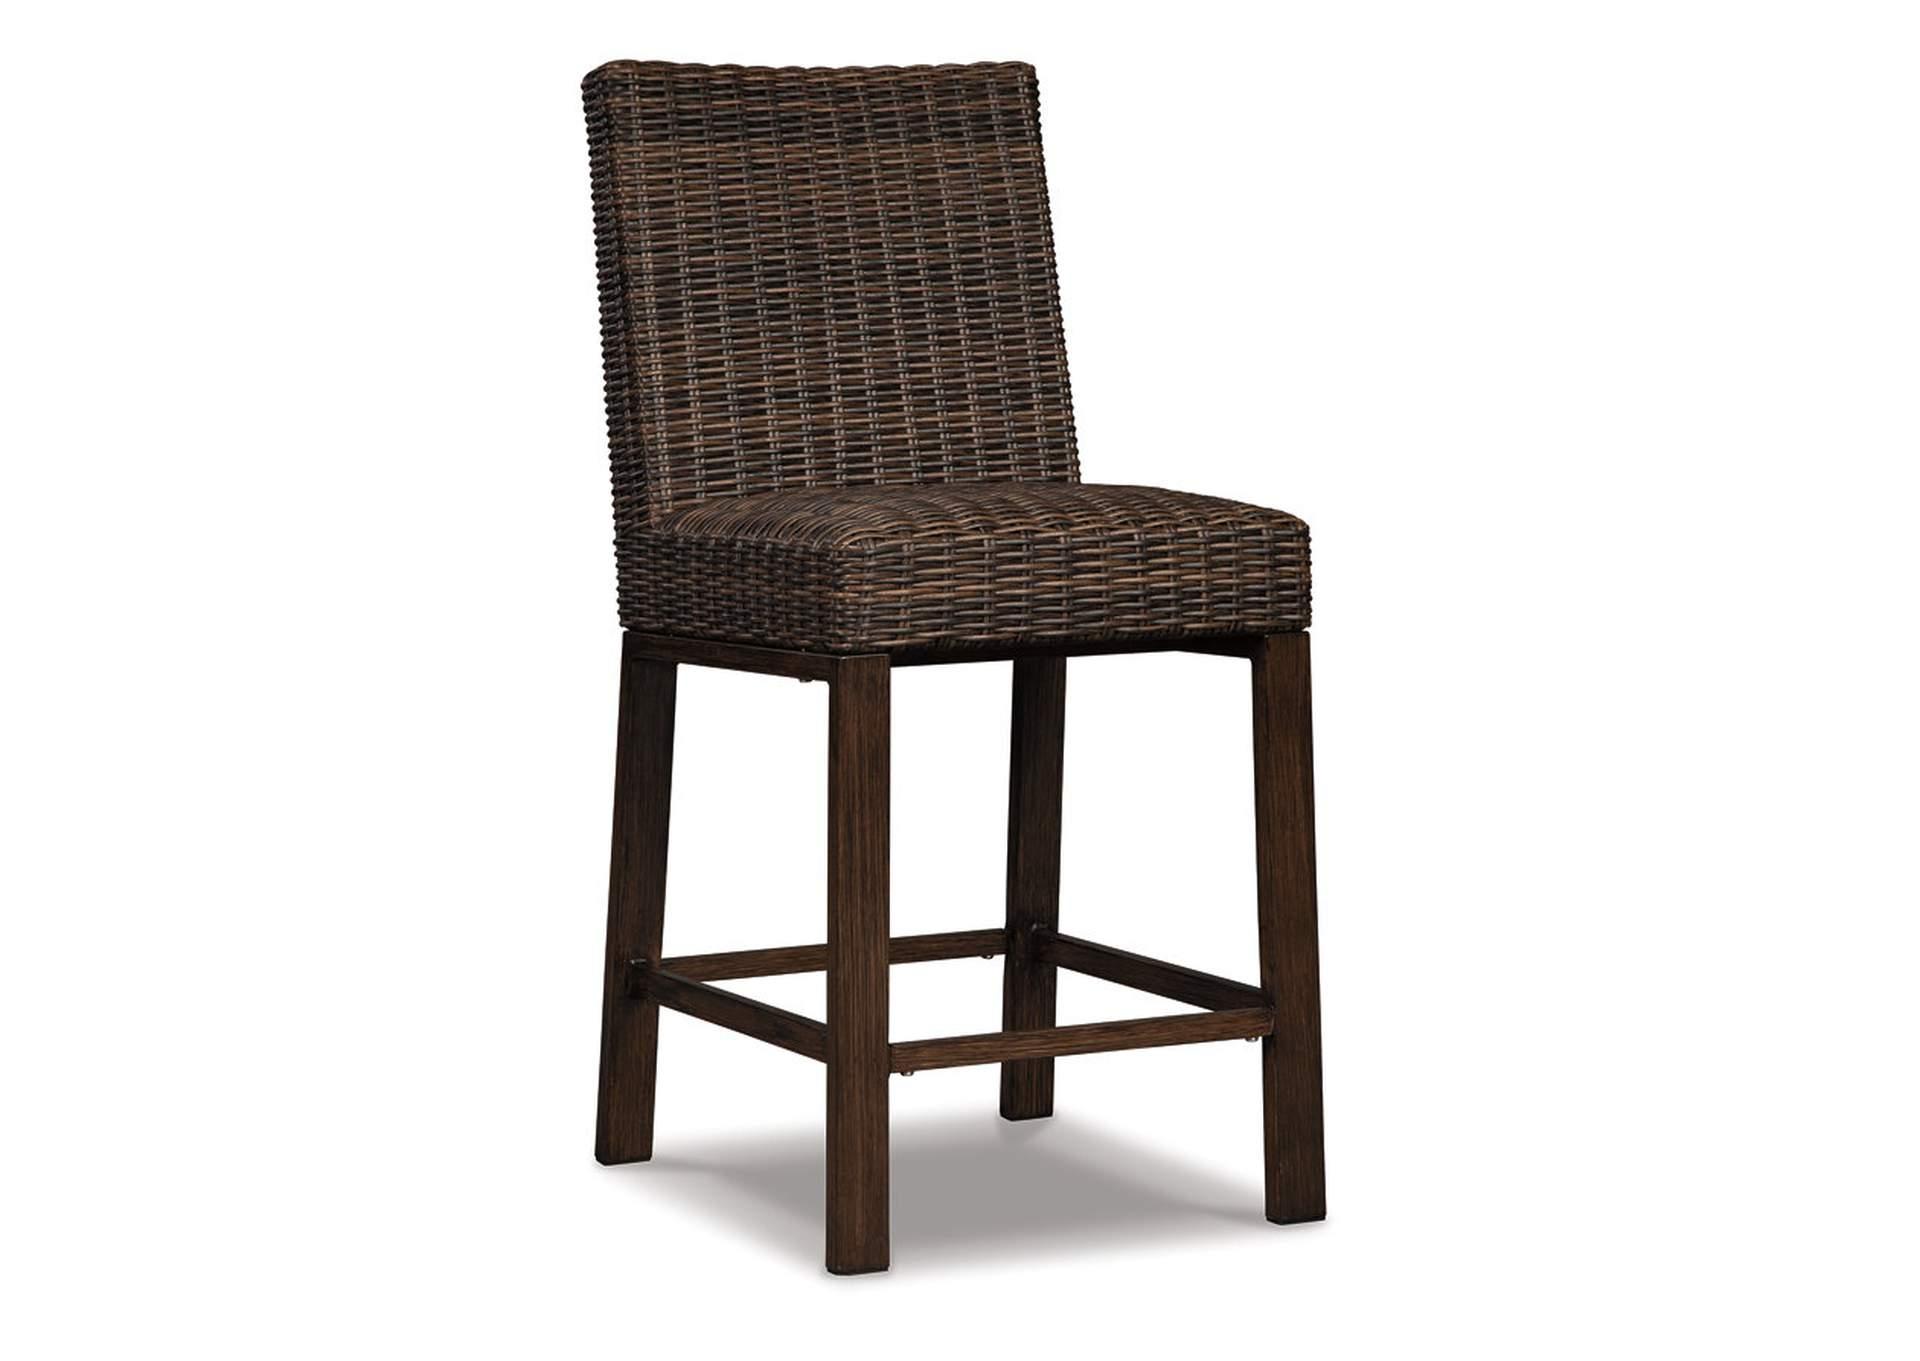 Paradise Trail Brown Барный стул (2 шт. в комплекте)